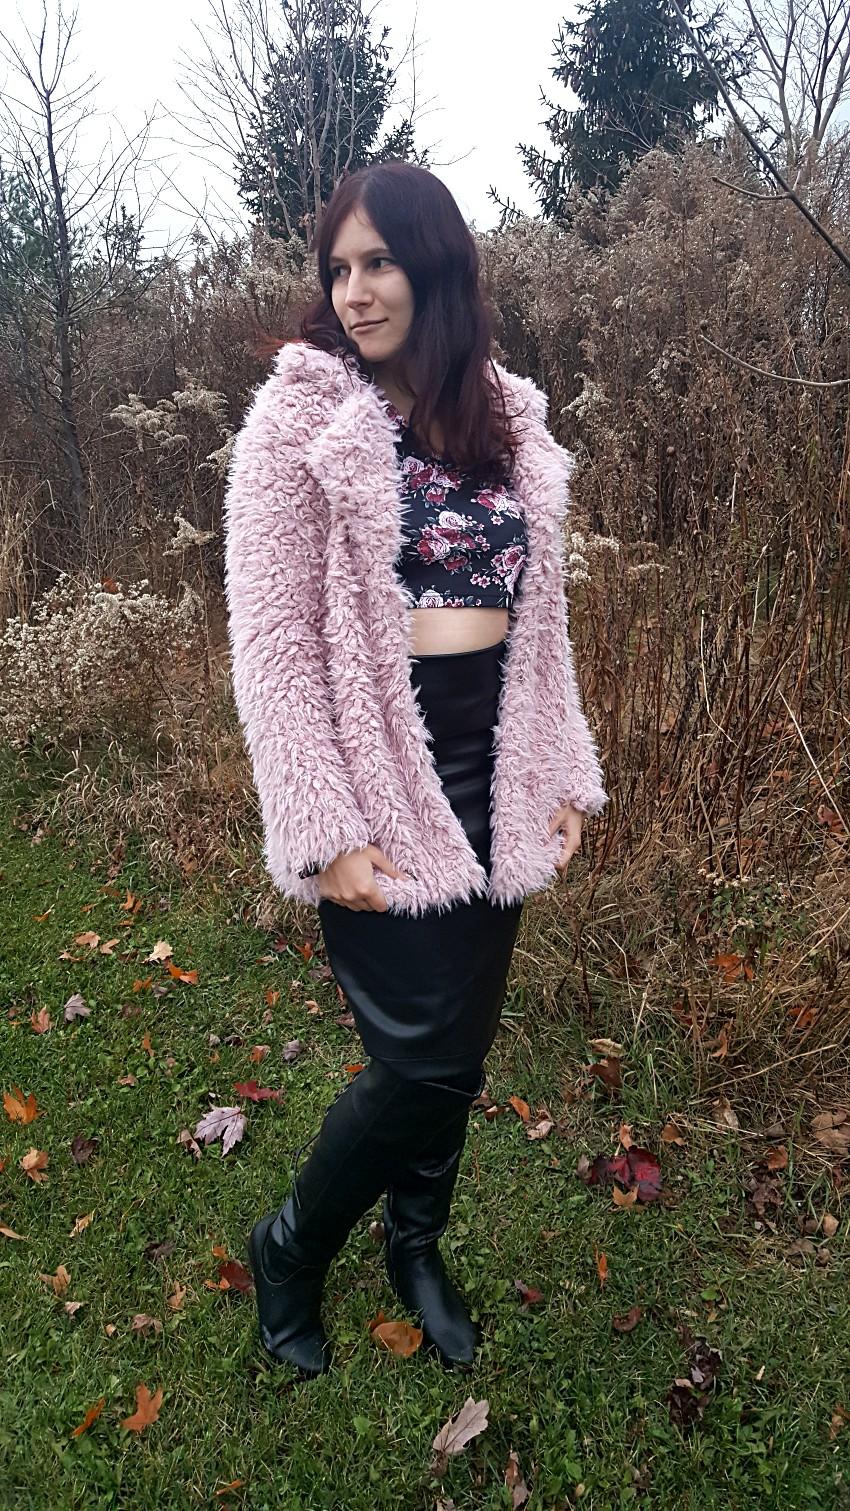 b86f5f0284 Polar Bear Style Pink Teddy Coat Black Leather Pencil Skirt Flared Sleeve  Crop Top Over-